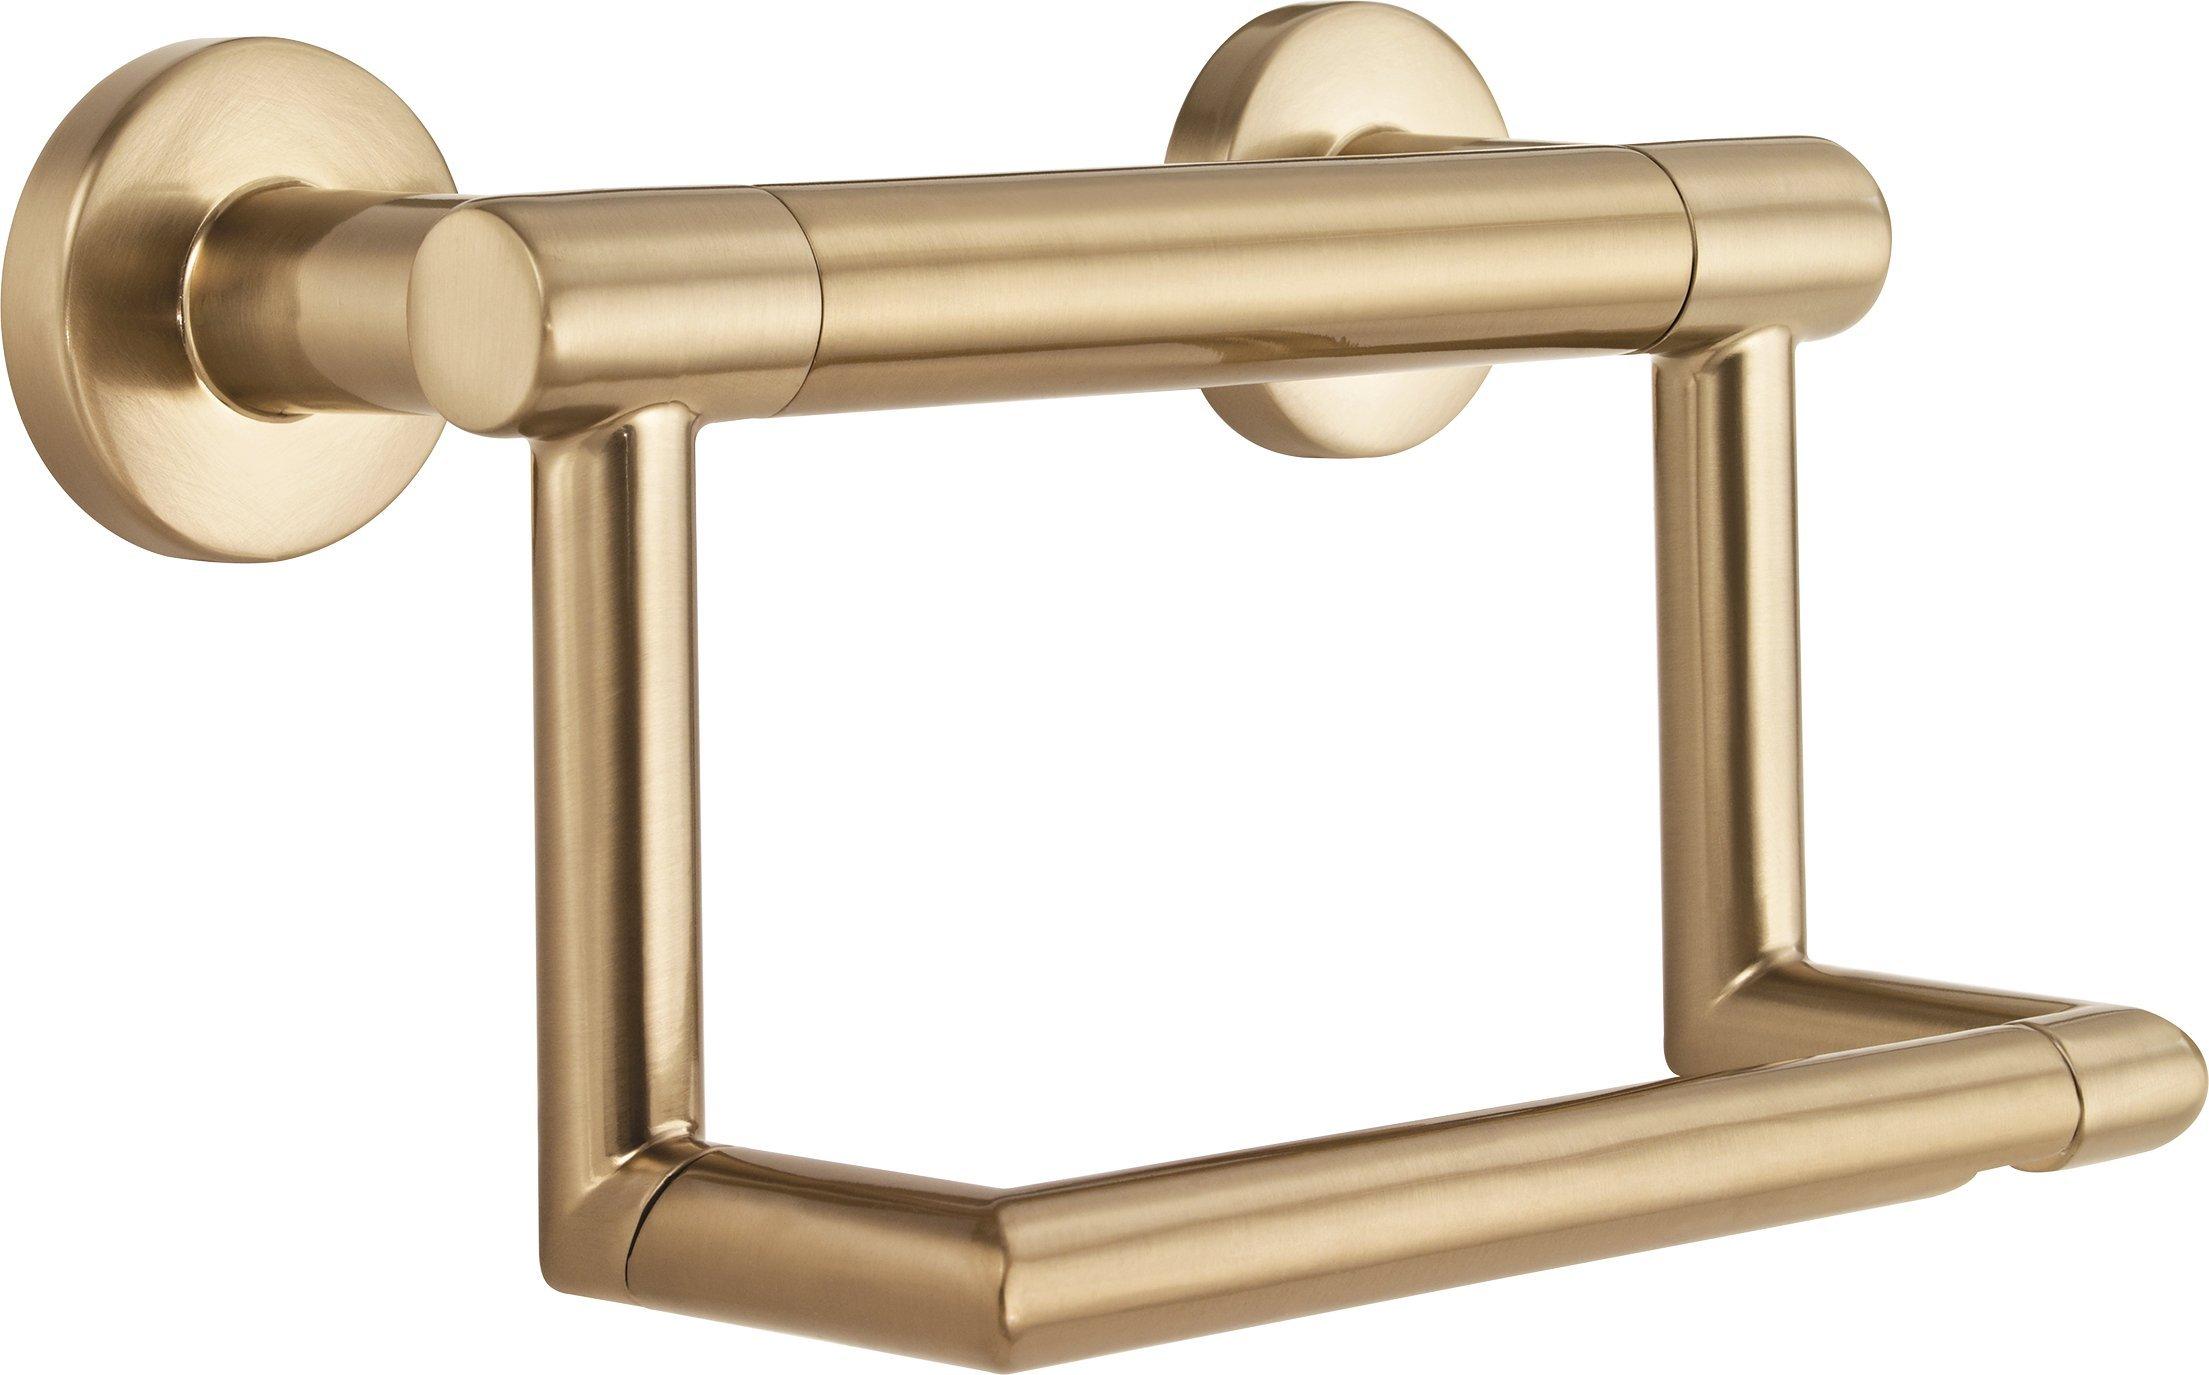 Delta Faucet 41550-CZ Contemporary Tissue Holder/Assist Bar, Champagne Bronze